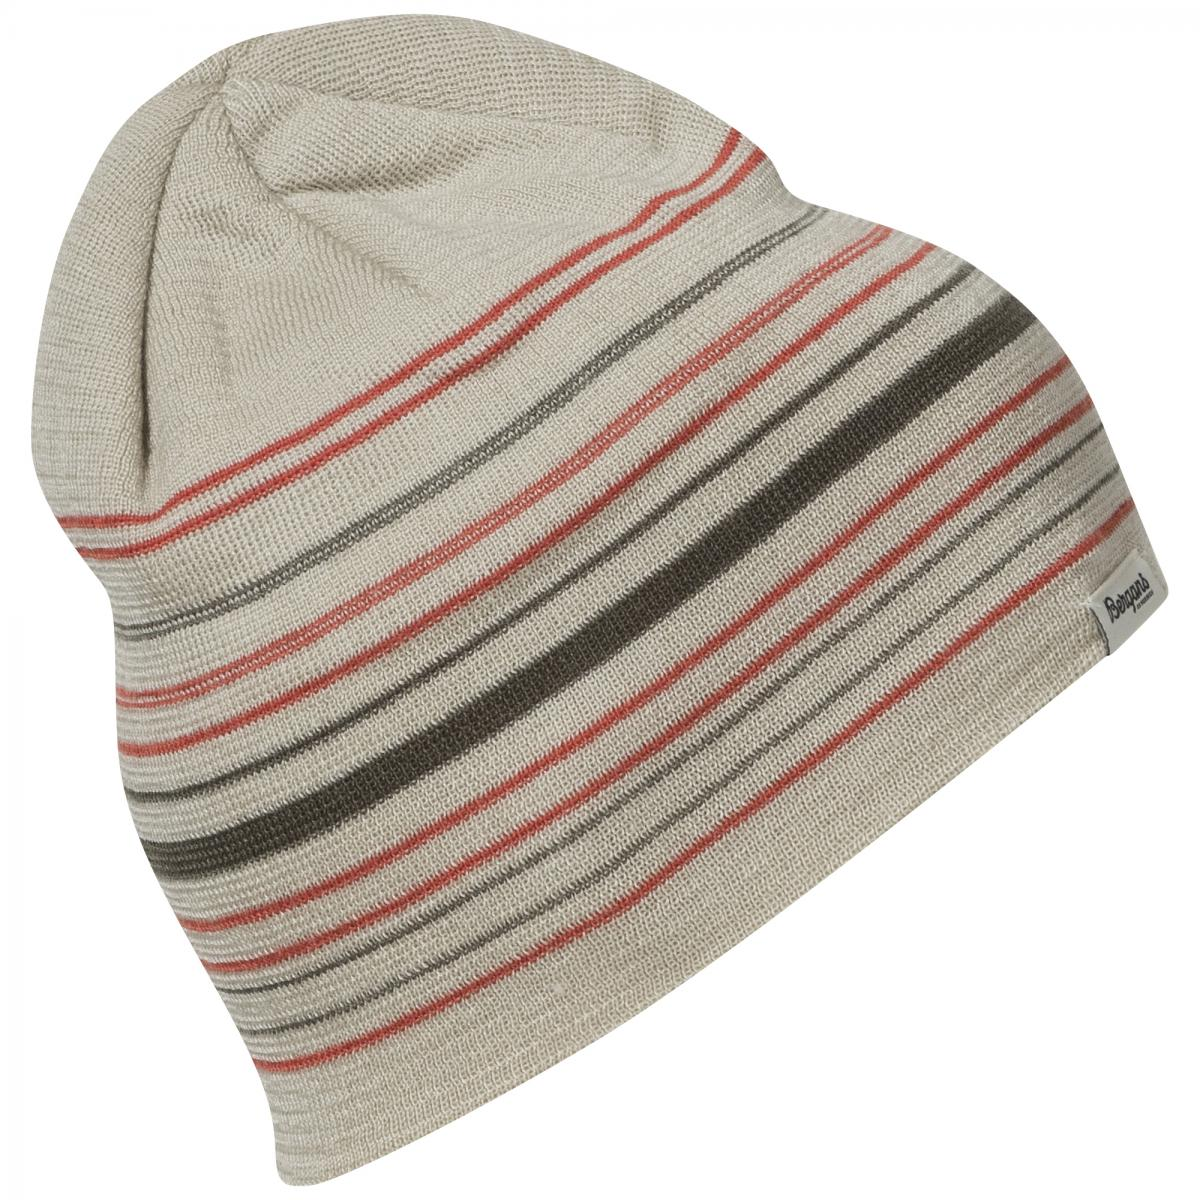 Bergans  Striped Beanie. lue, unisex